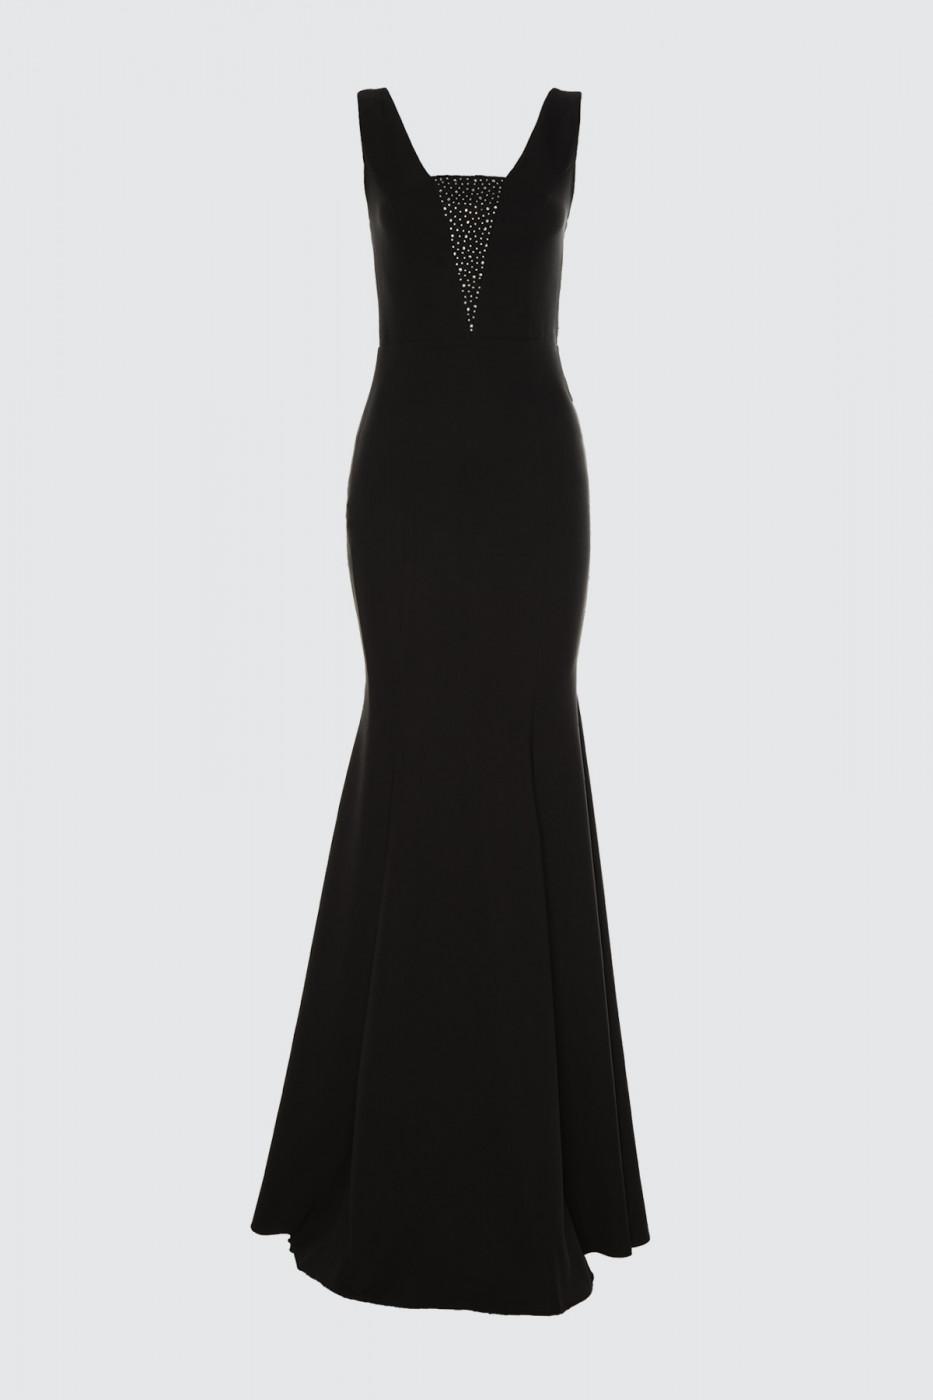 Trendyol Black Stone Printed Evening Dress & Graduation Dress